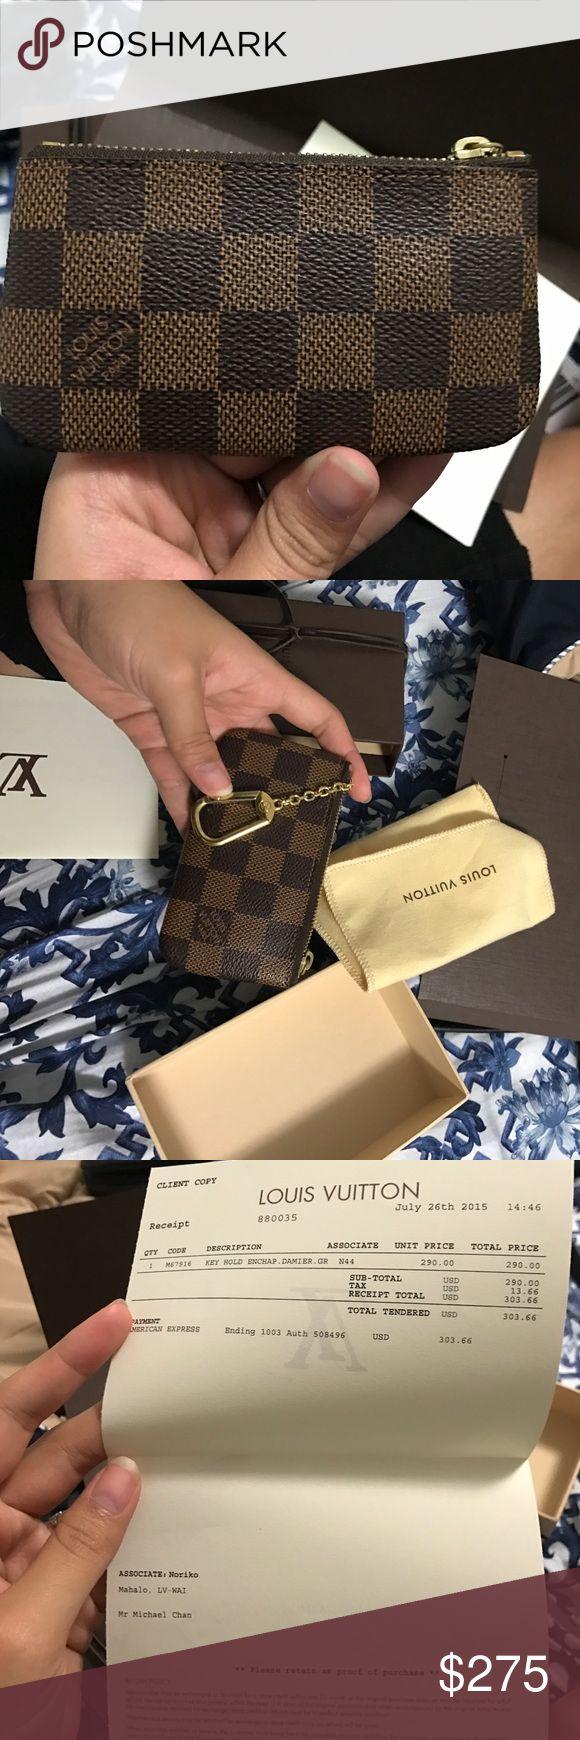 Brand New Louis Vuitton Key Pouch NWT Louis Vuitton Key chain holder, never used Louis Vuitton Accessories Key & Card Holders